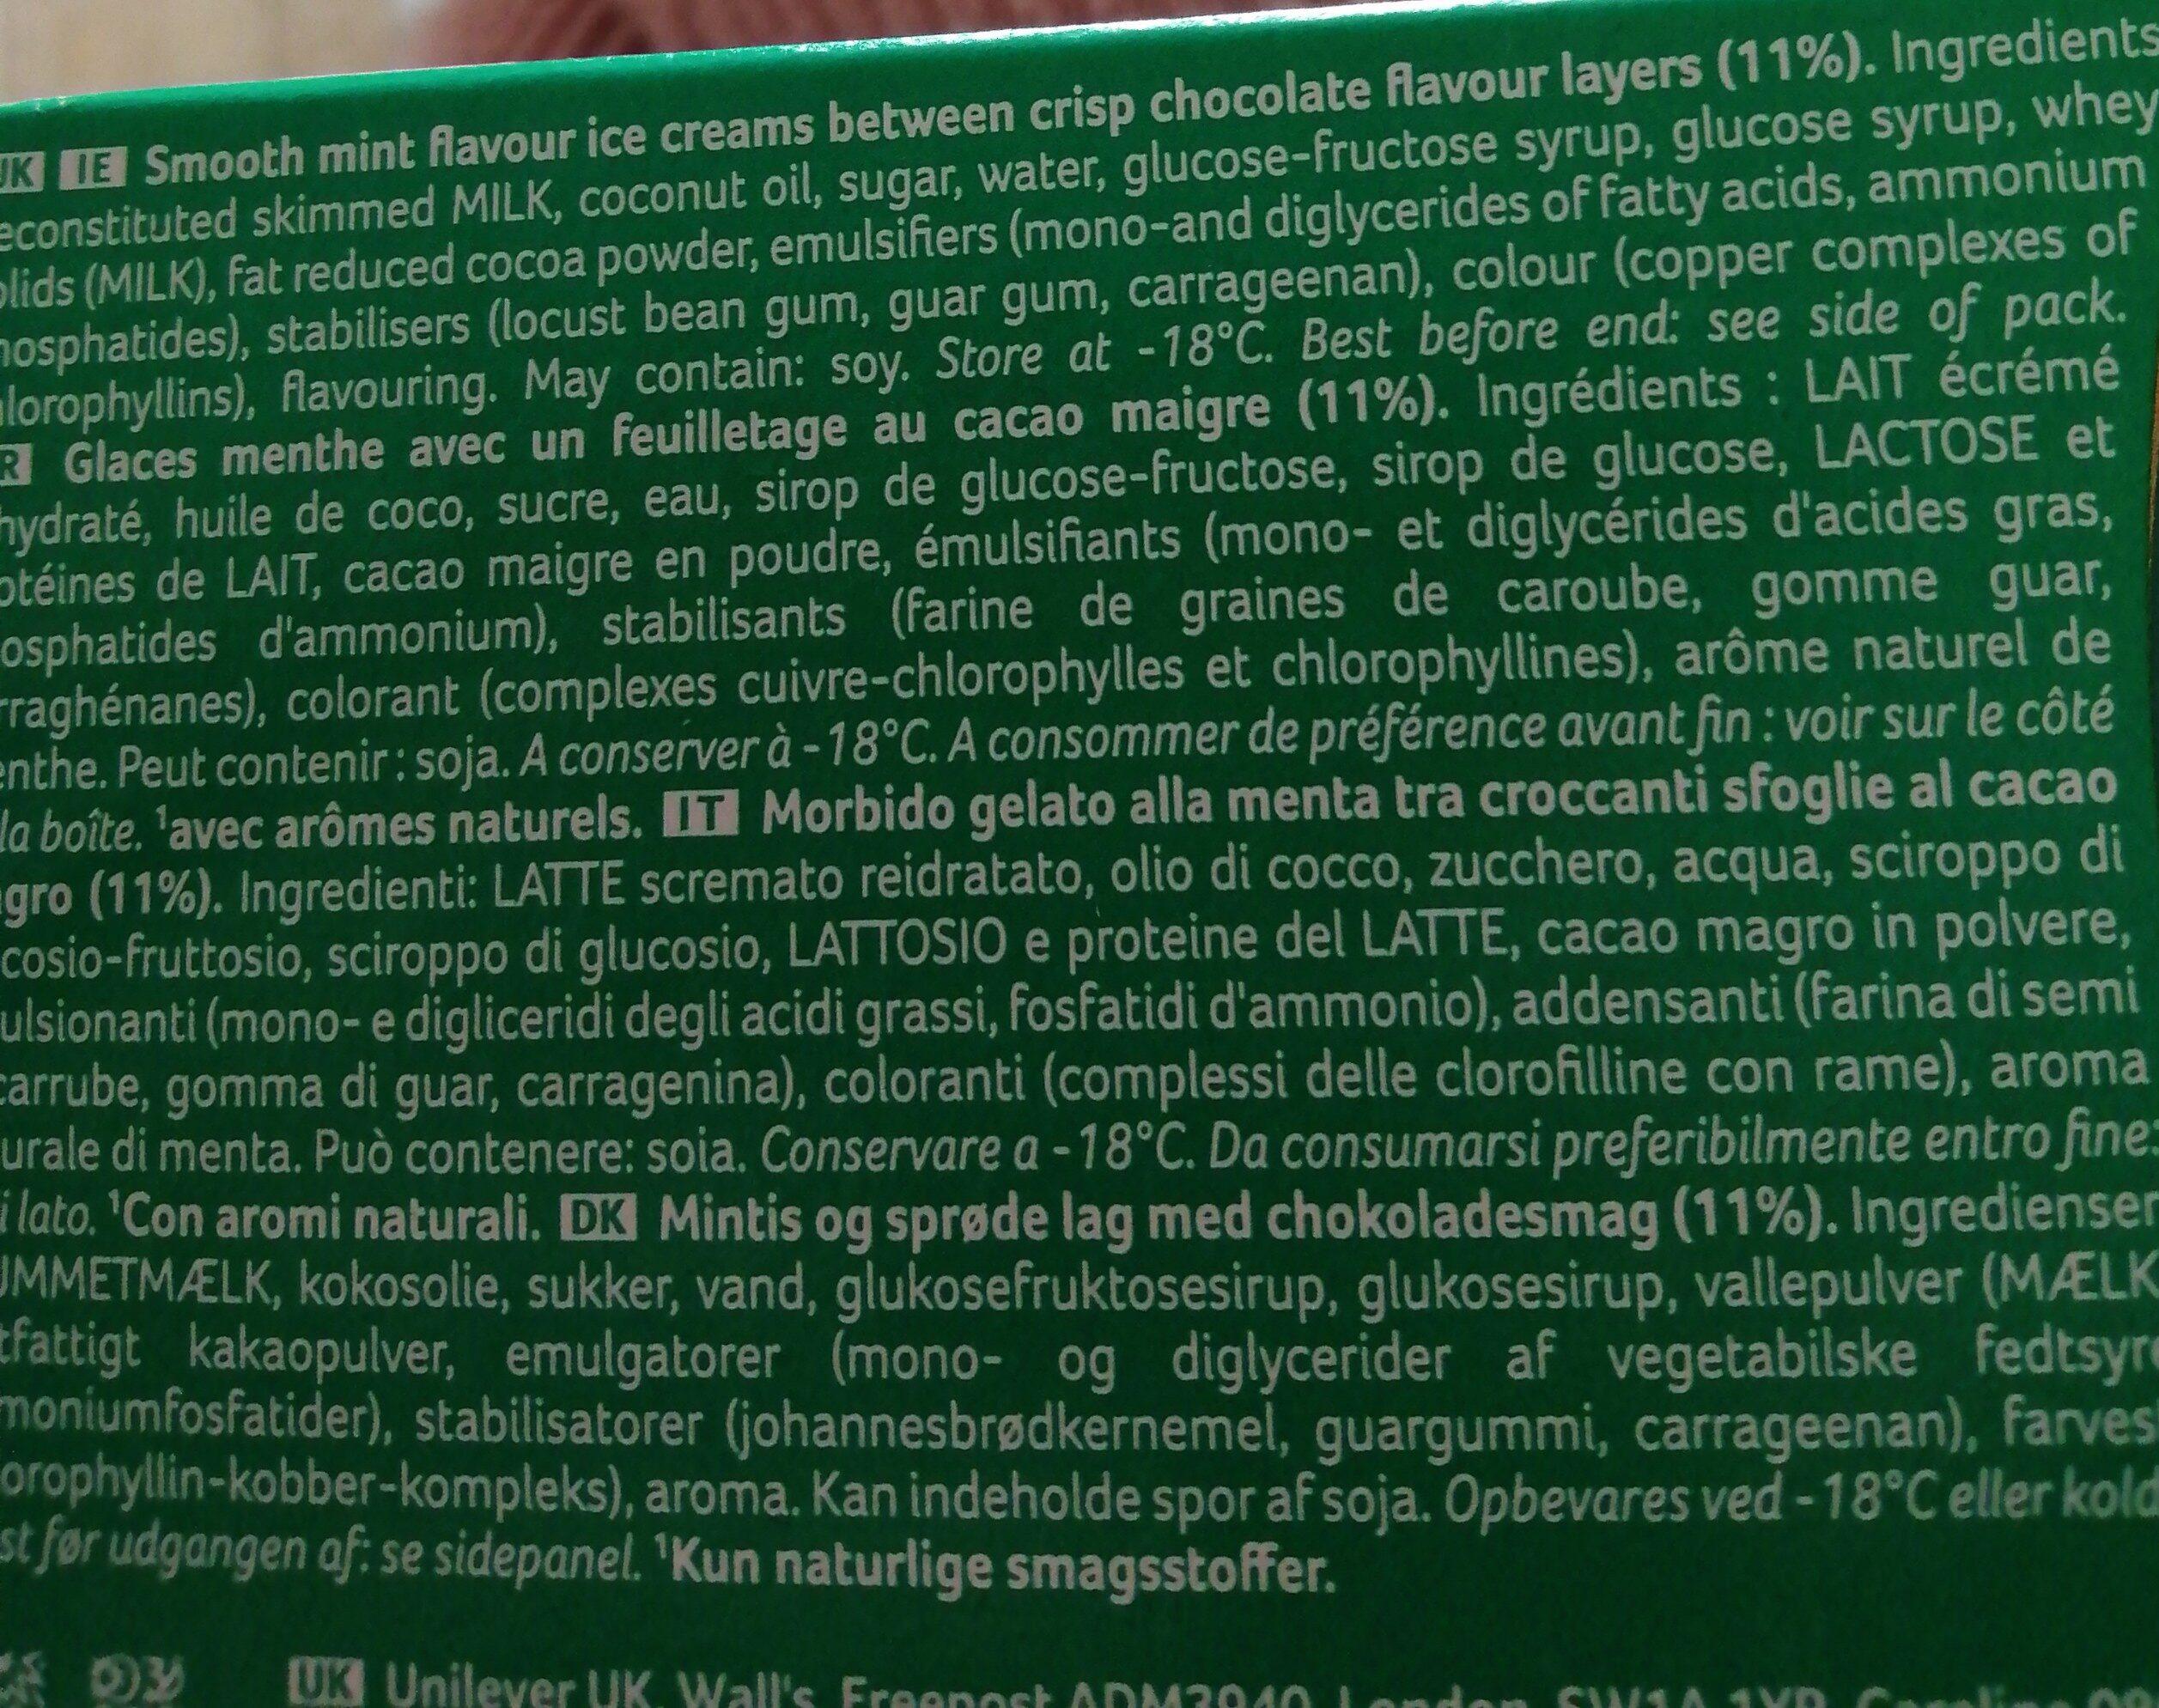 walls viennetta - Ingredients - en